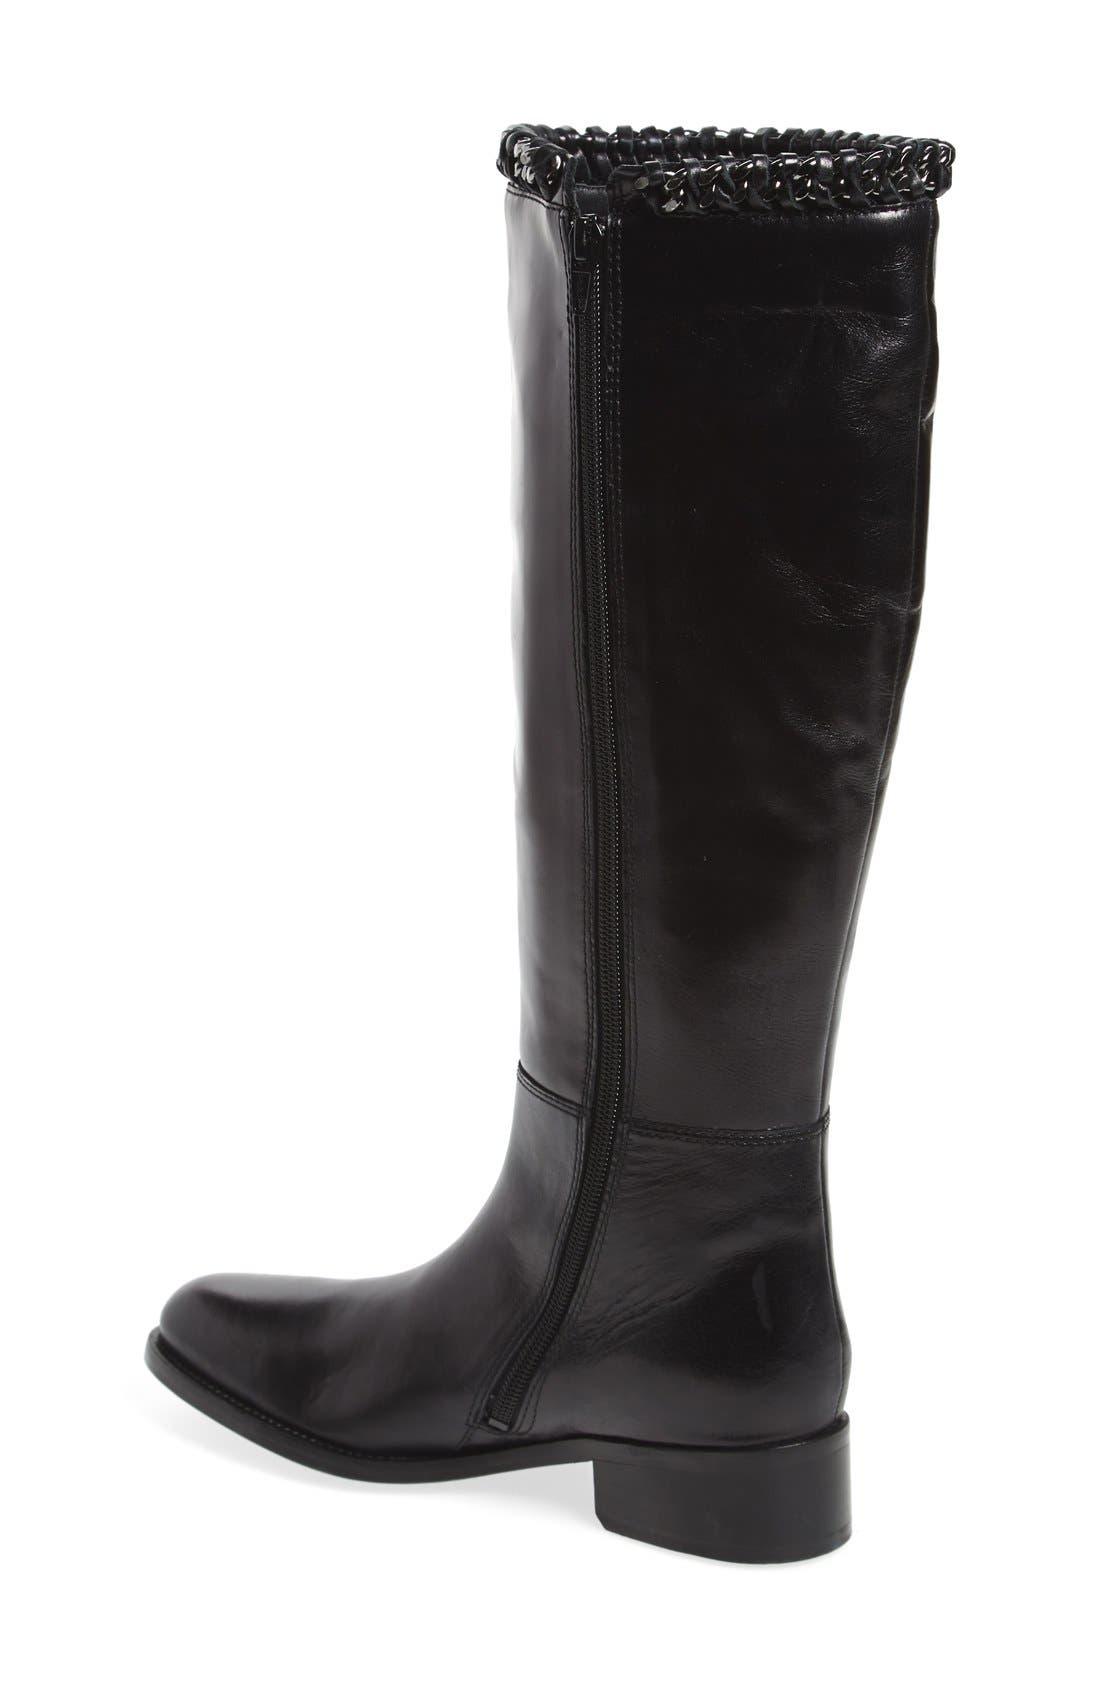 Alternate Image 2  - Johnston & Murphy 'Sari' Knee High Boot (Women)